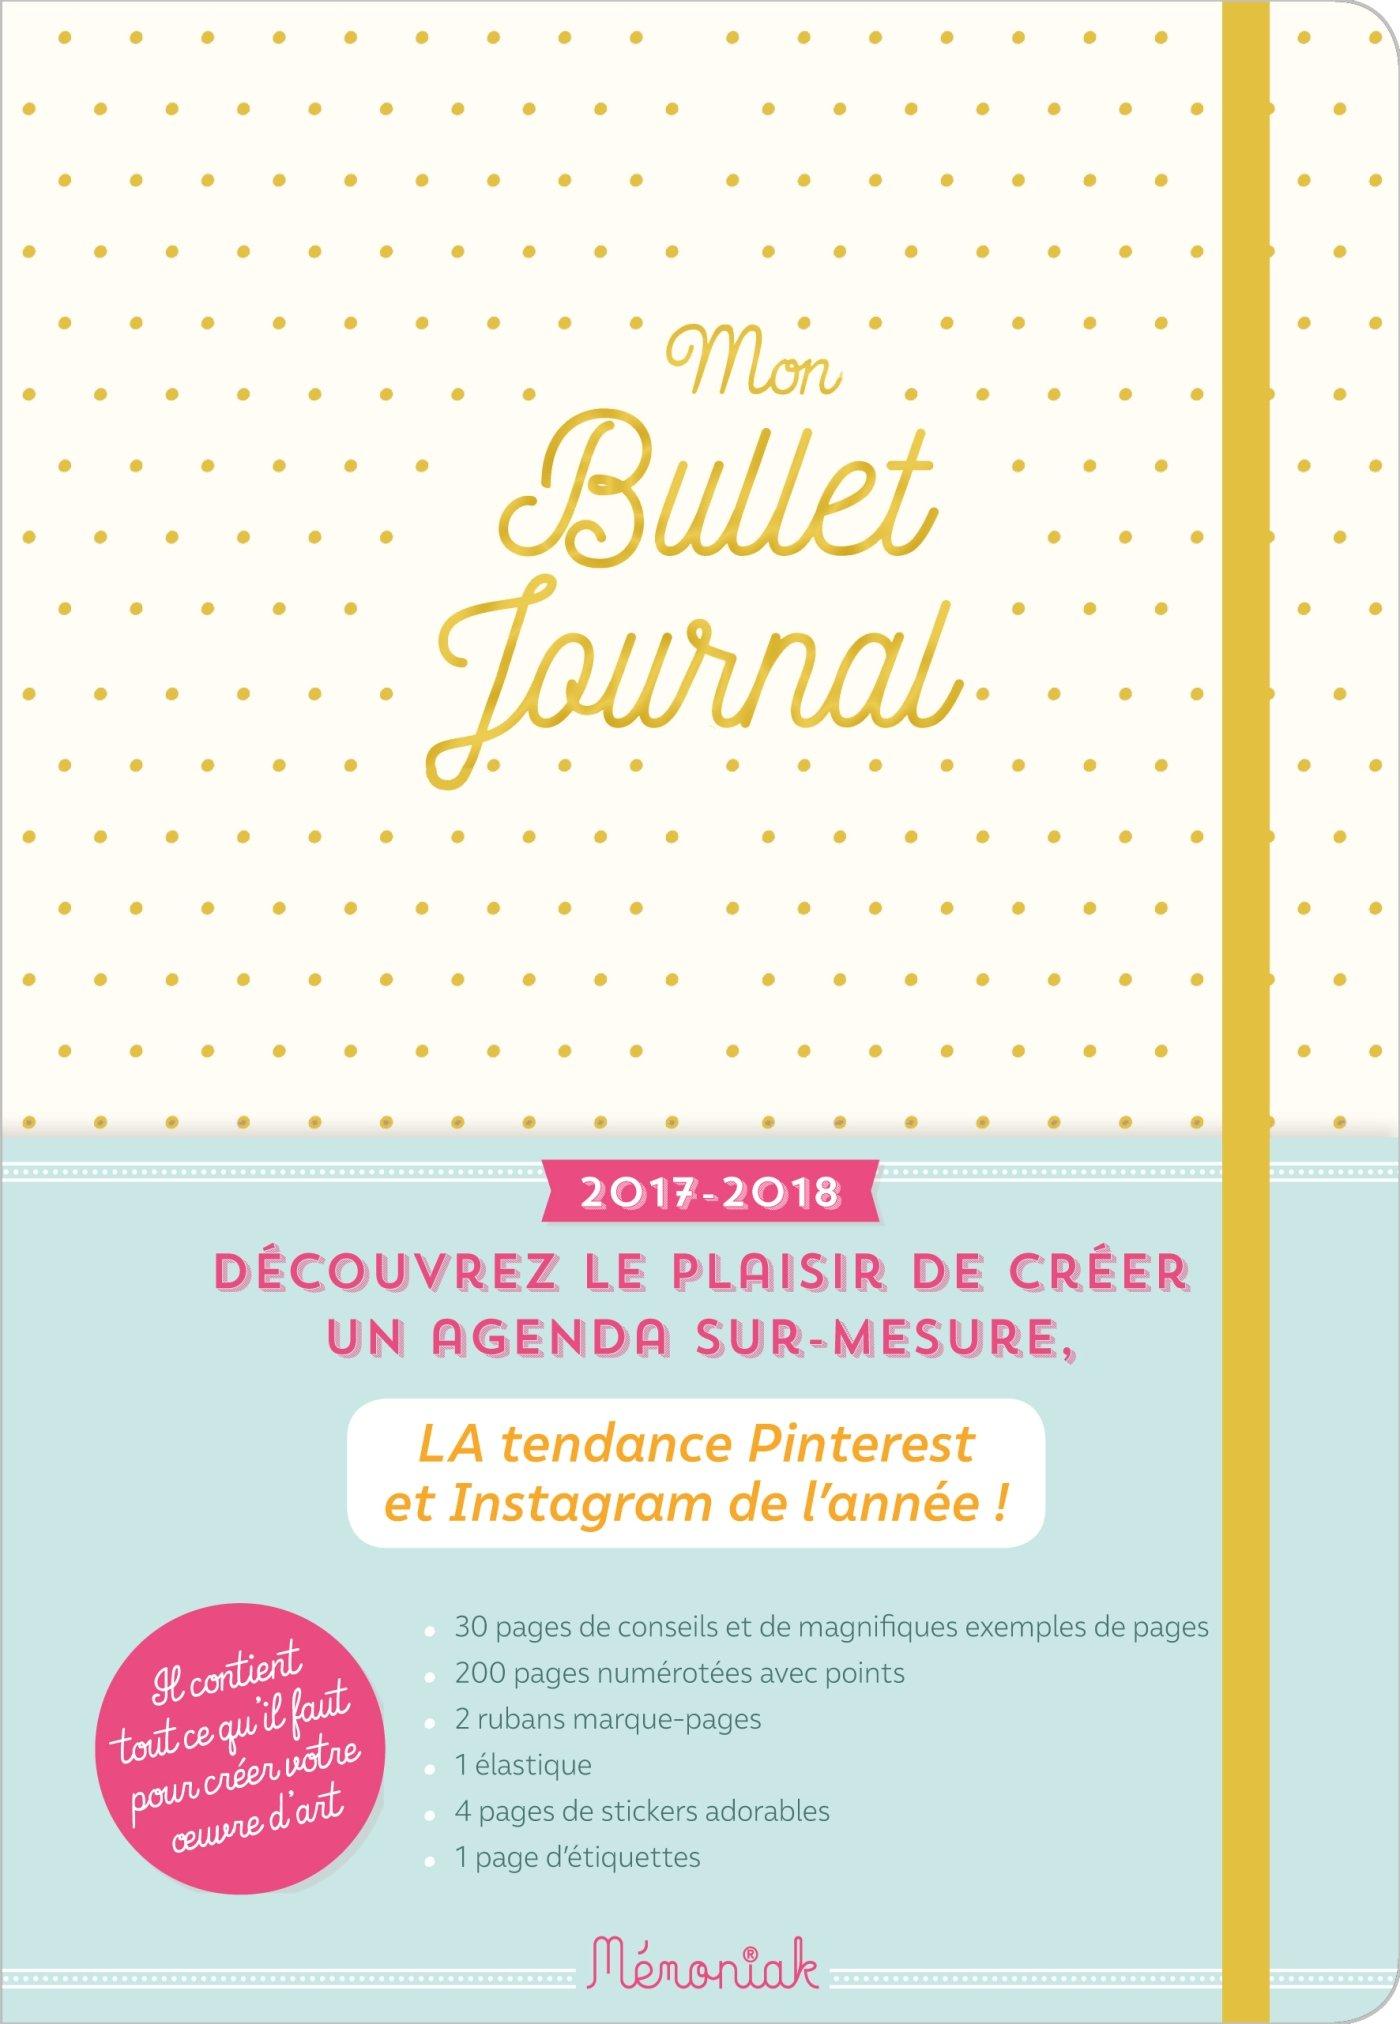 Mon bullet journal Mémoniak 2017-2018: Amazon.es: Maud Taron ...